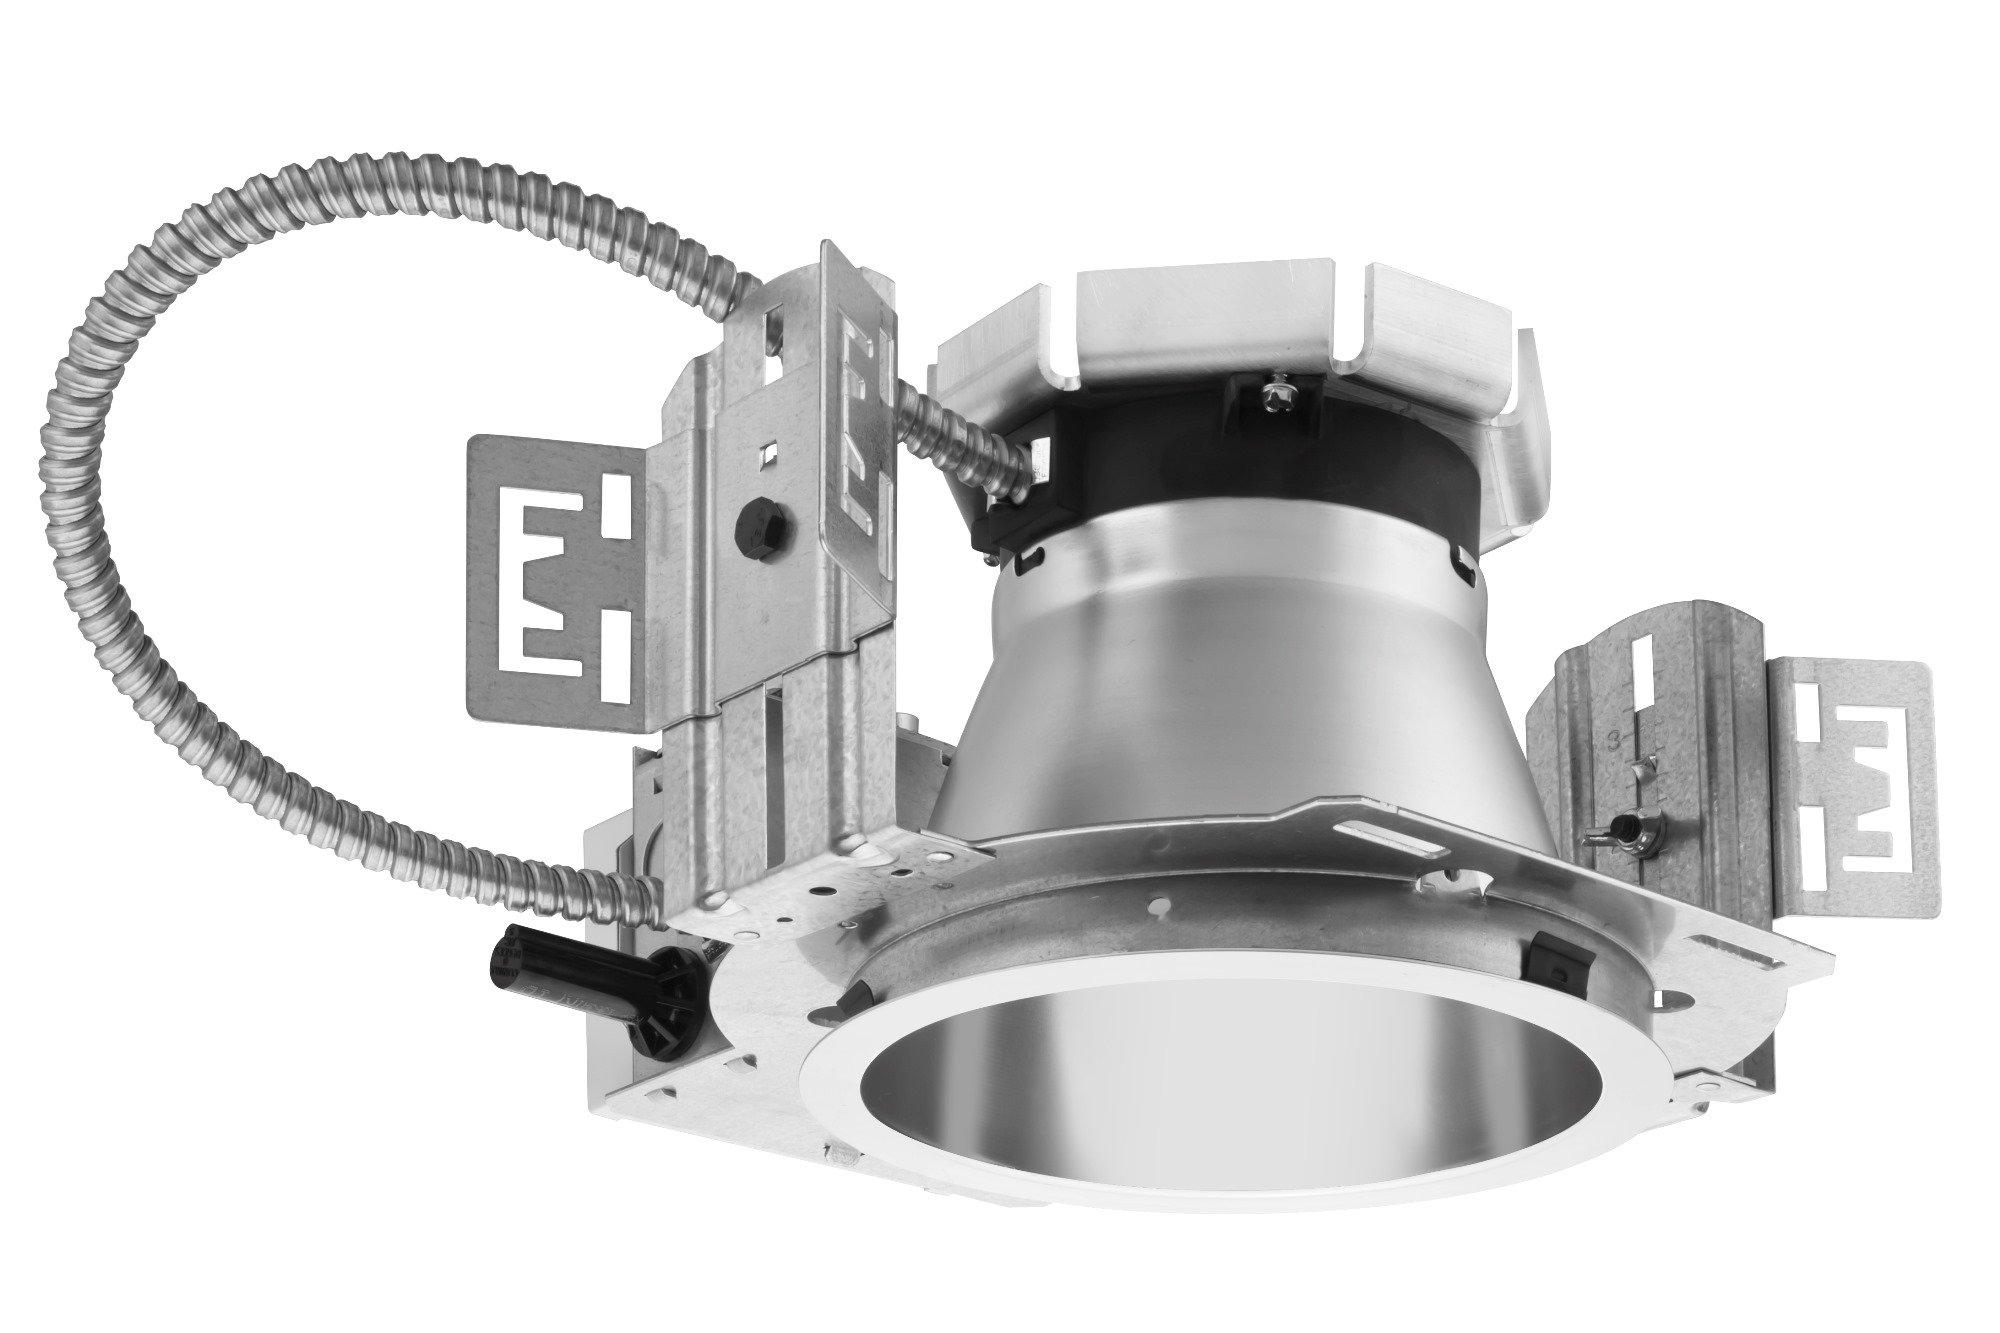 Lithonia Lighting LDN6 35/15 120 HSG Gen 1 6-Inch 3500K LED Recessed Housing